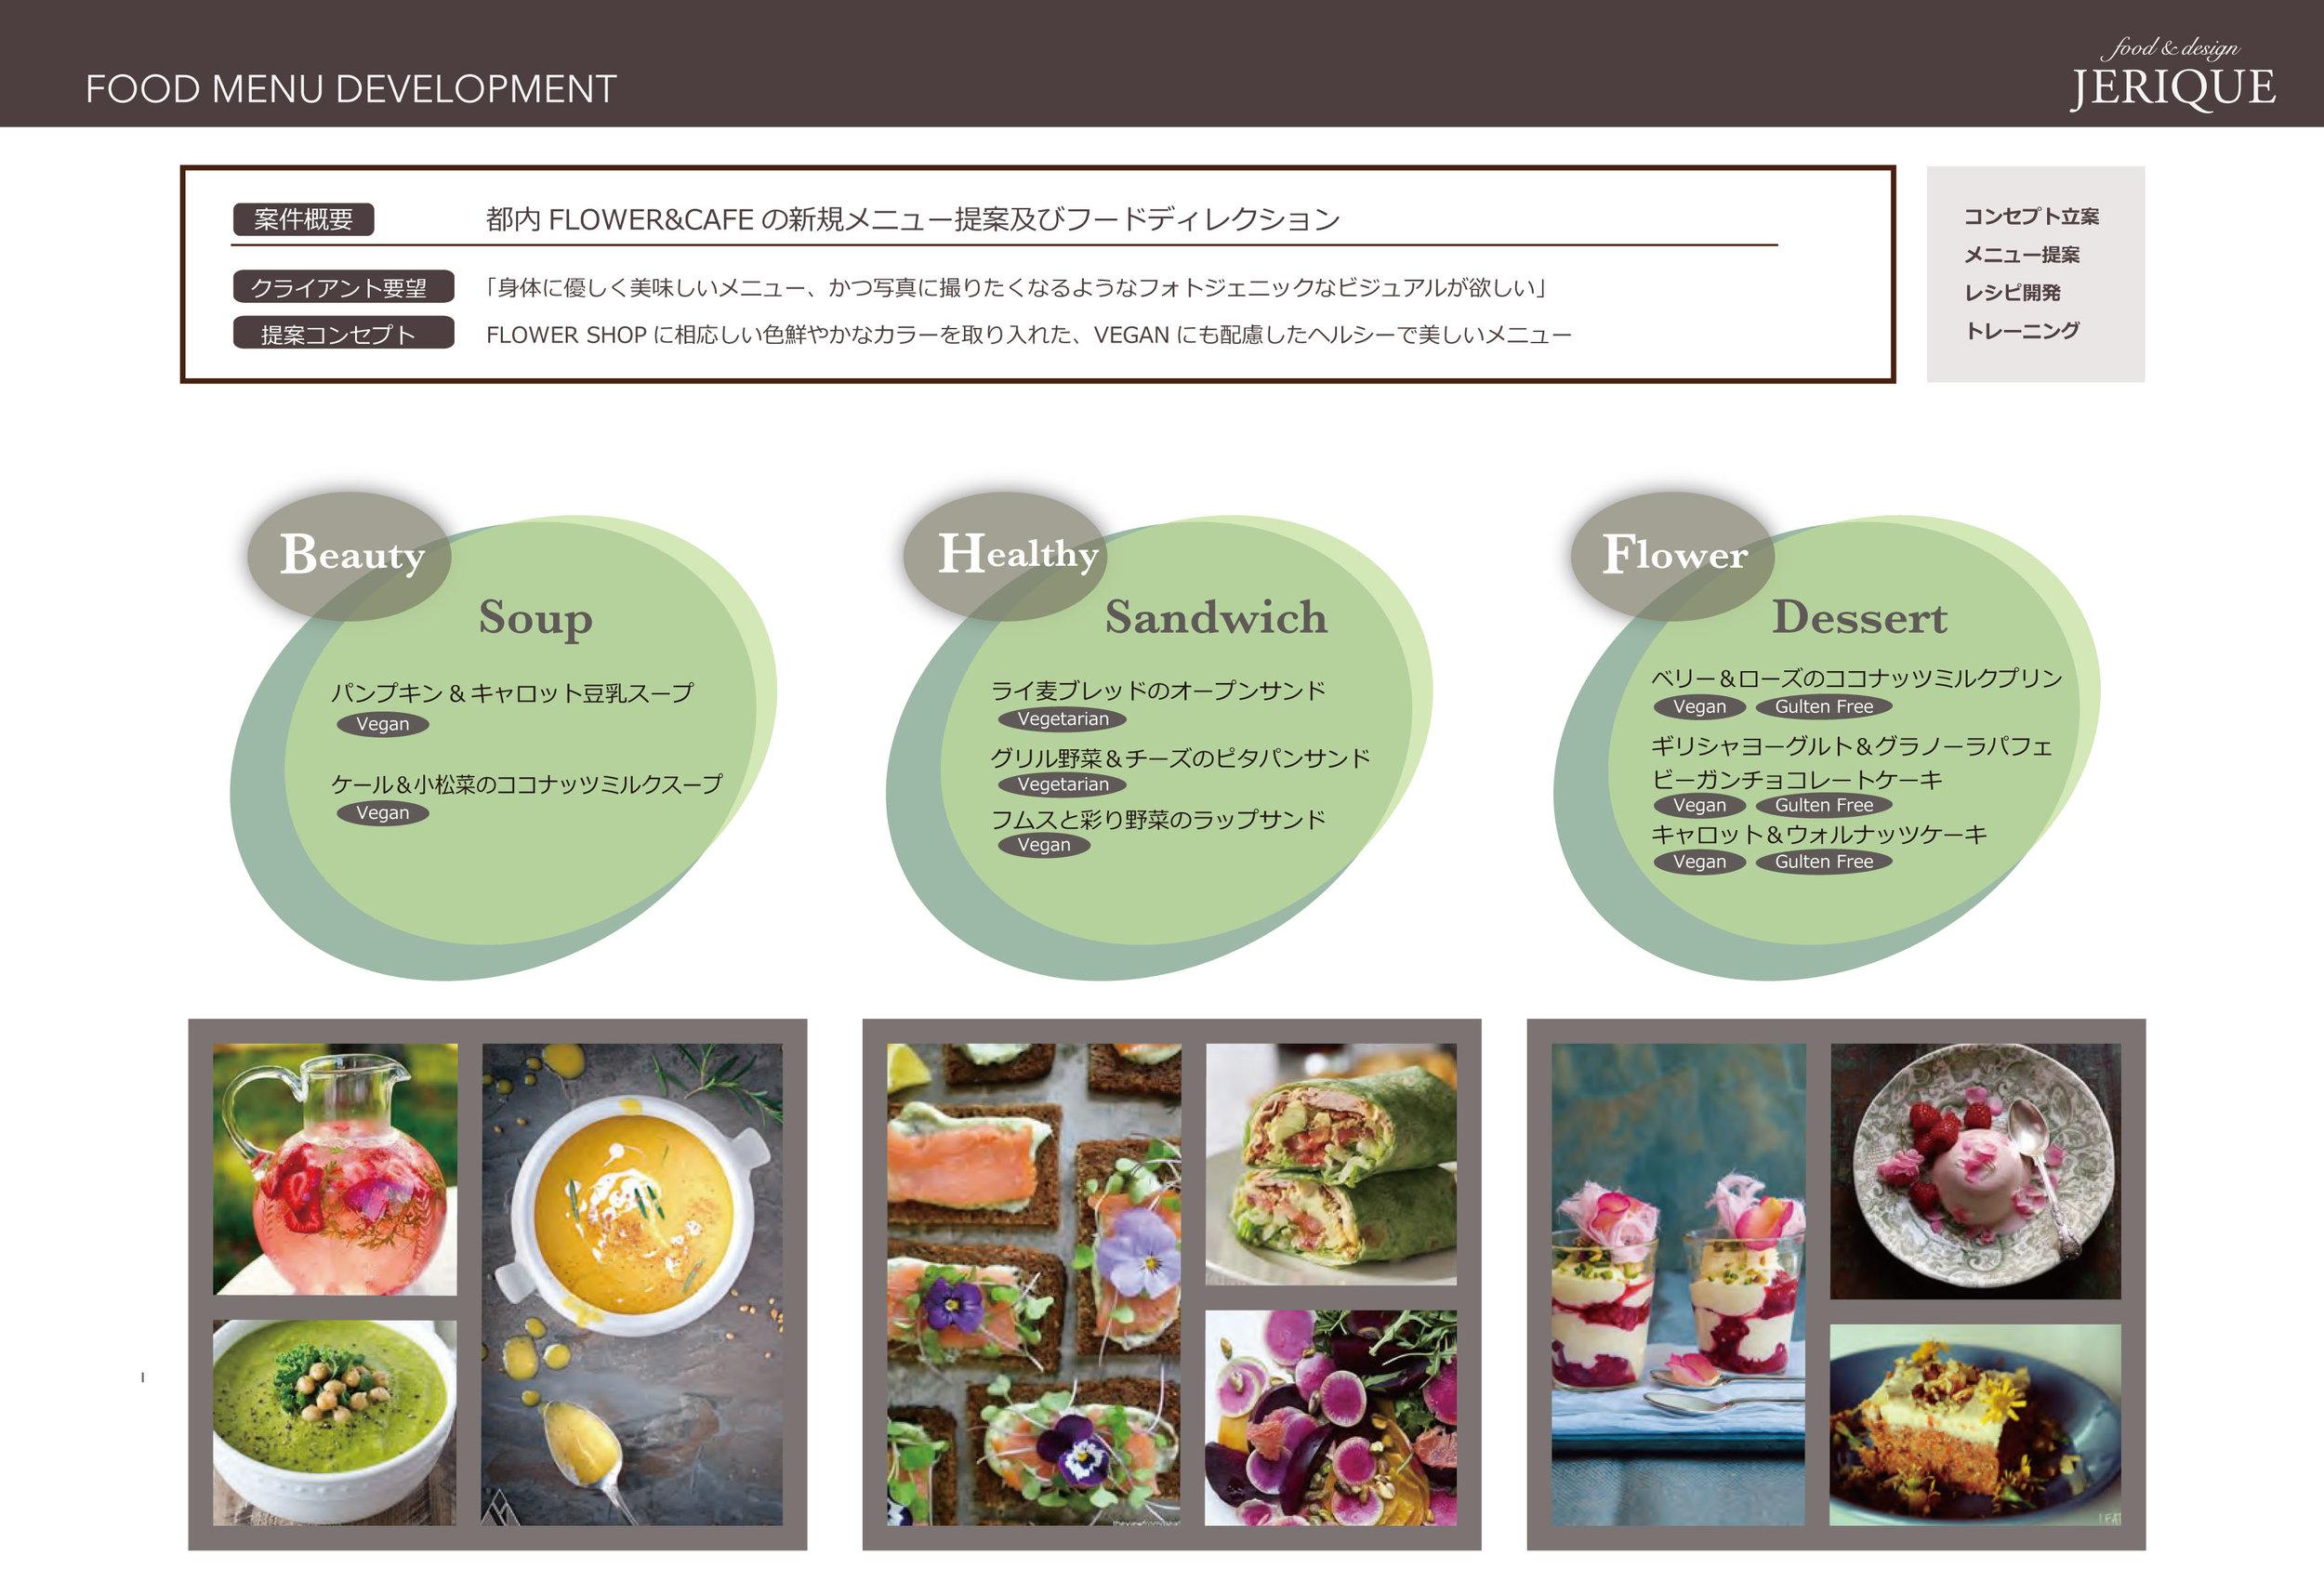 JERIQUE_FOOD DEVELOPMENT-2.jpg